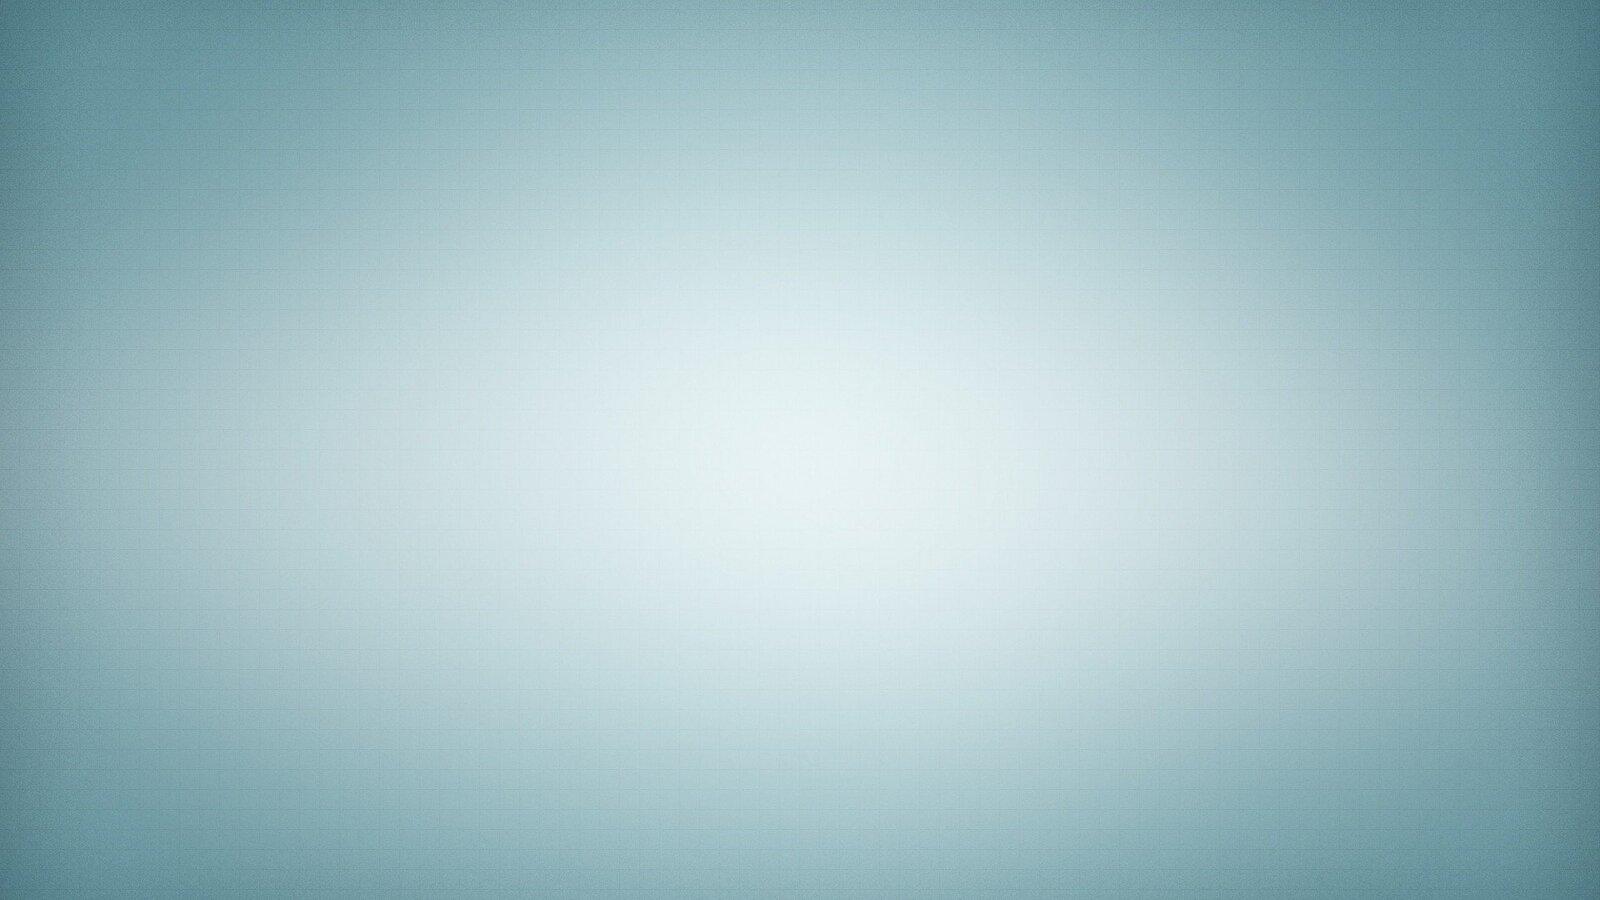 background-texture-wallpaper.jpg